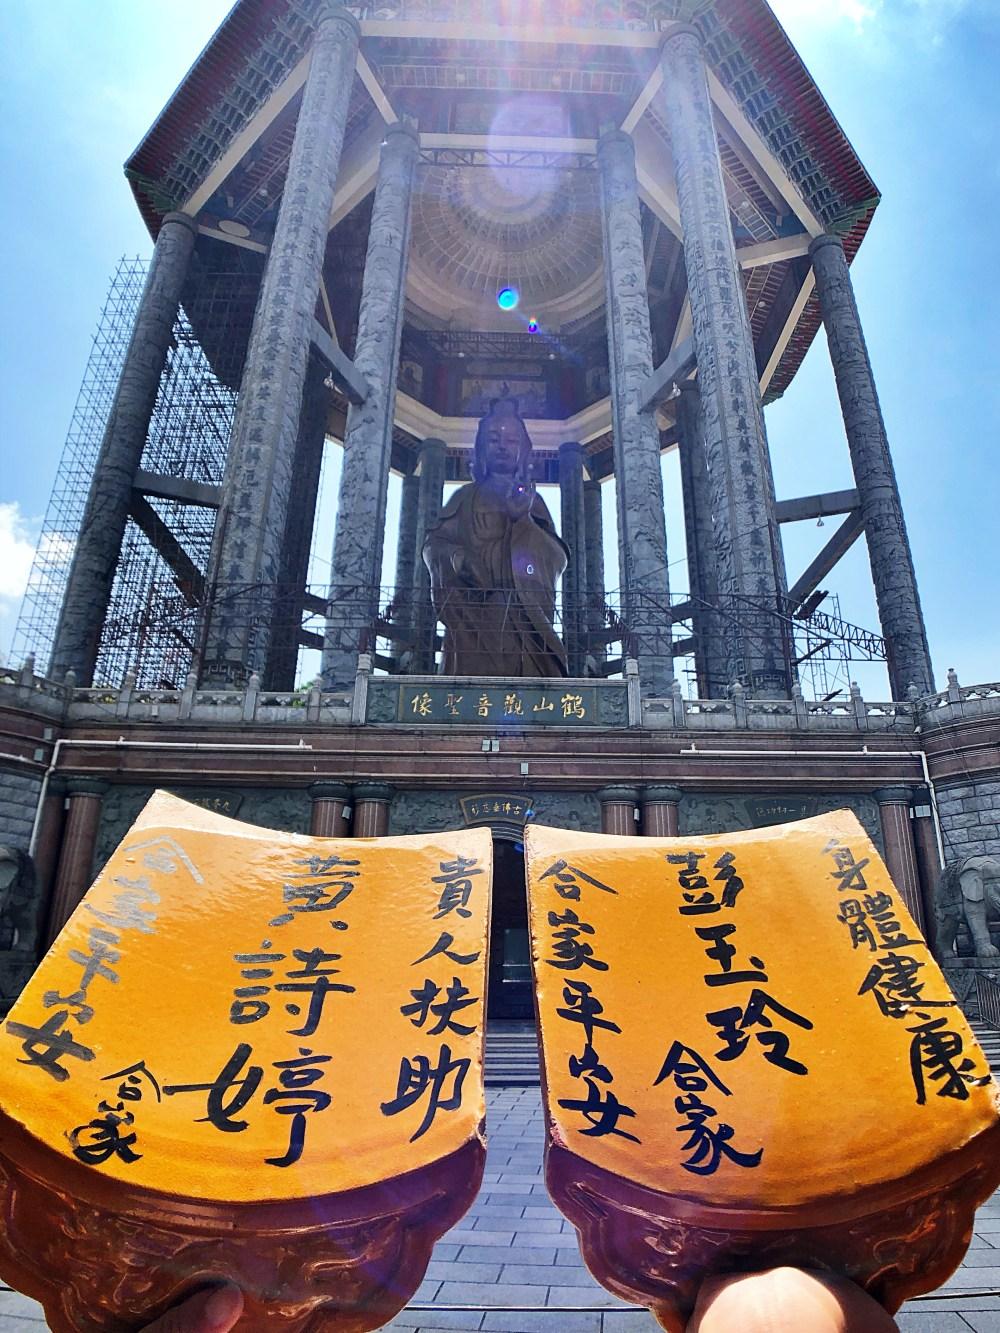 23 March 2019: Kek Lok Si Temple